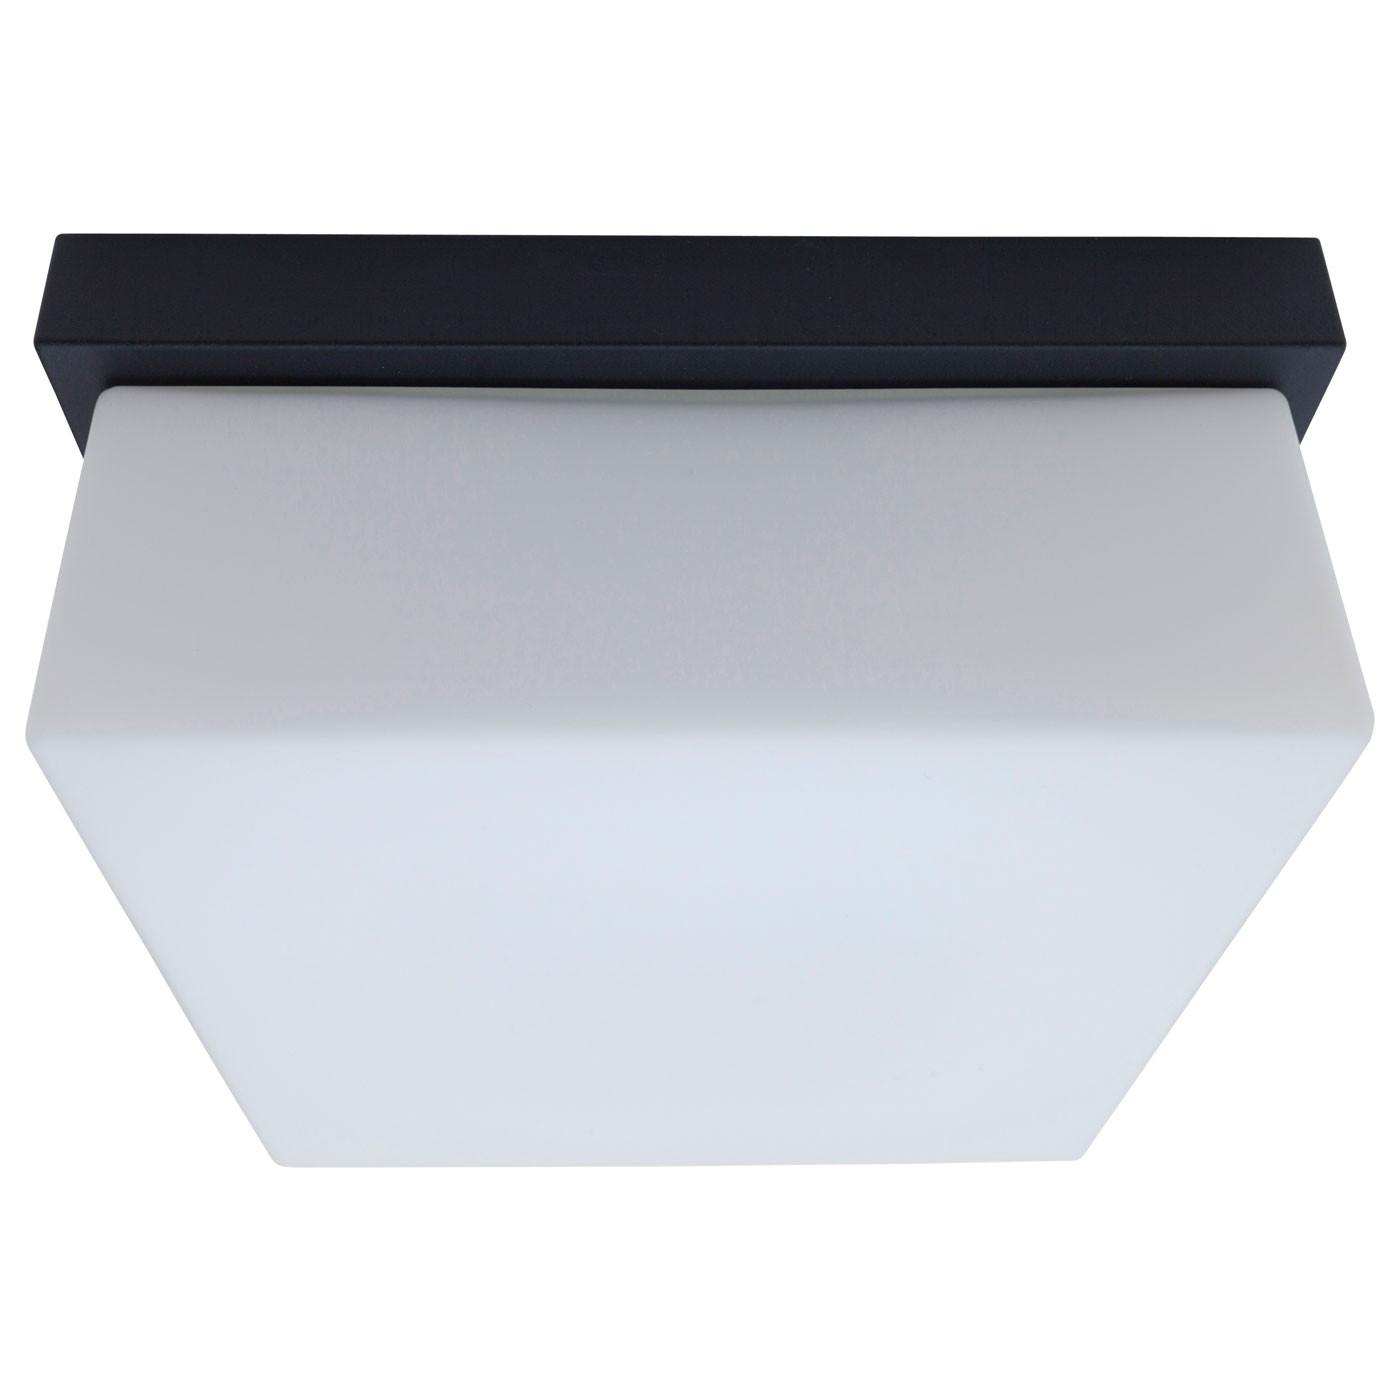 Bega 33032 LED Wand-/Deckenleuchte